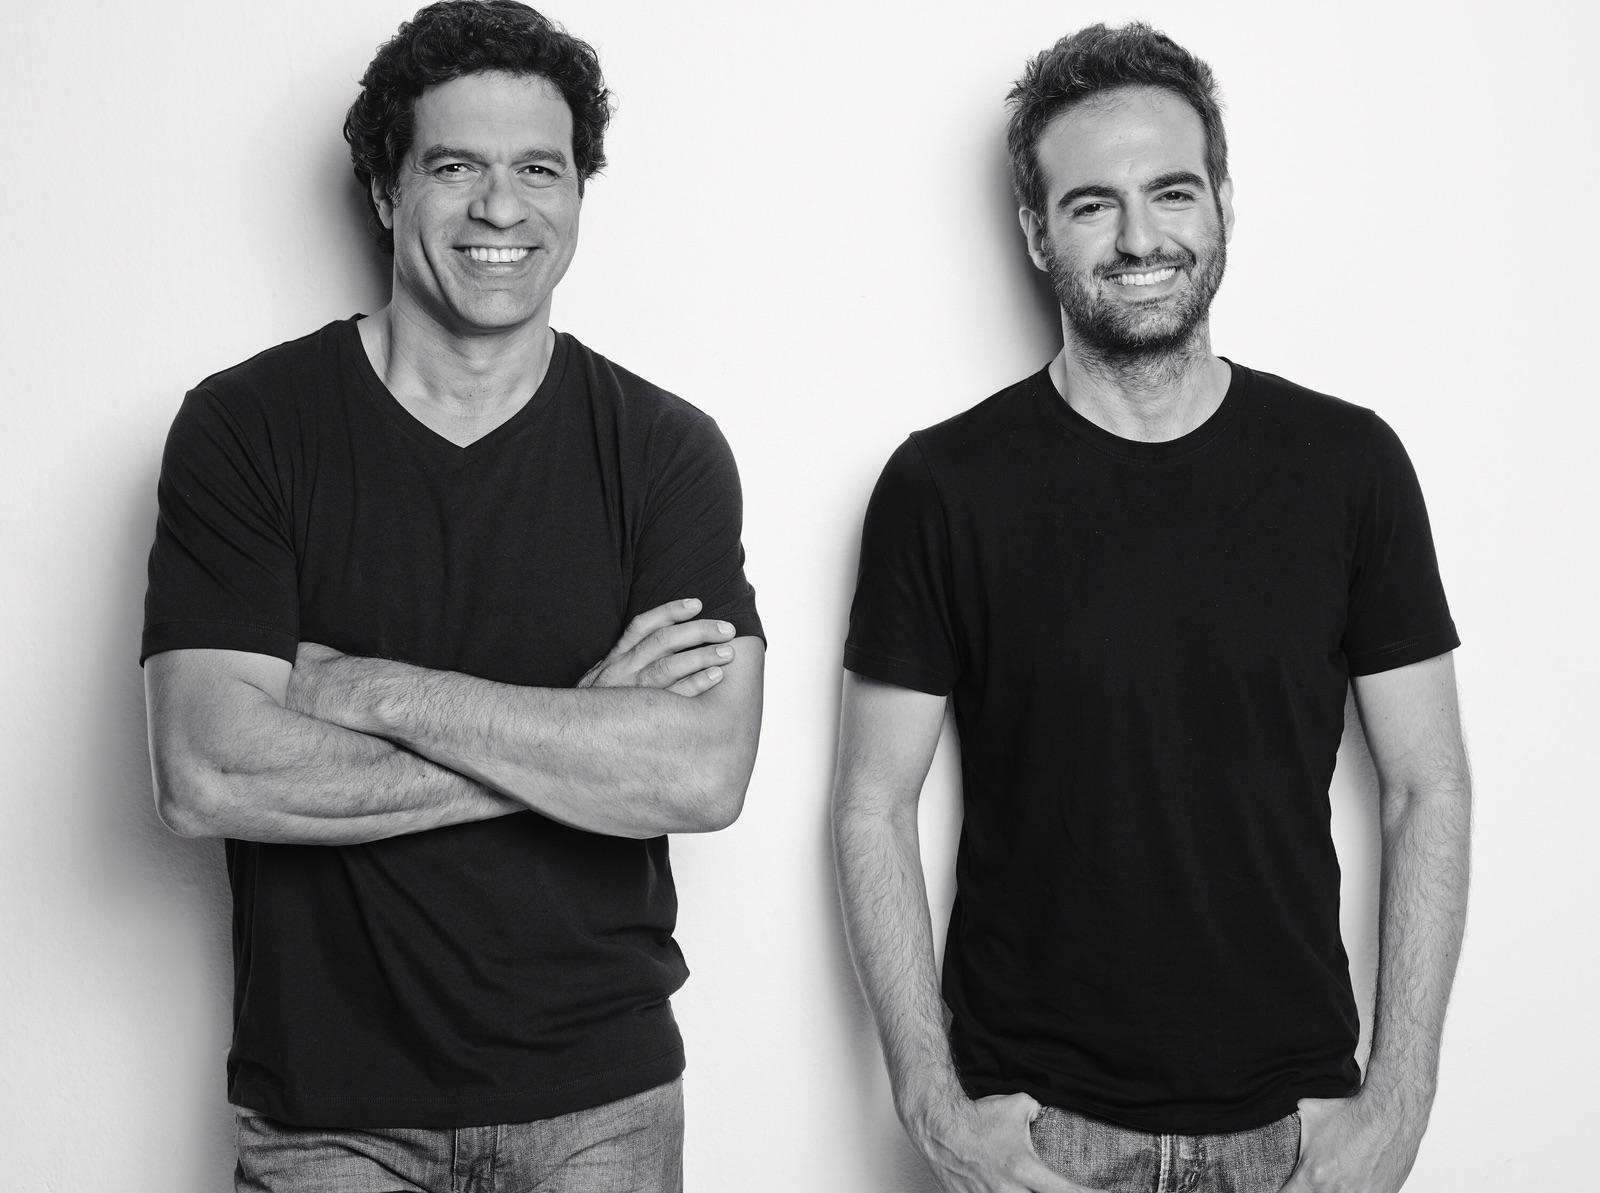 Raï et Paulo Velasco. Photo: Bob Wolfenson